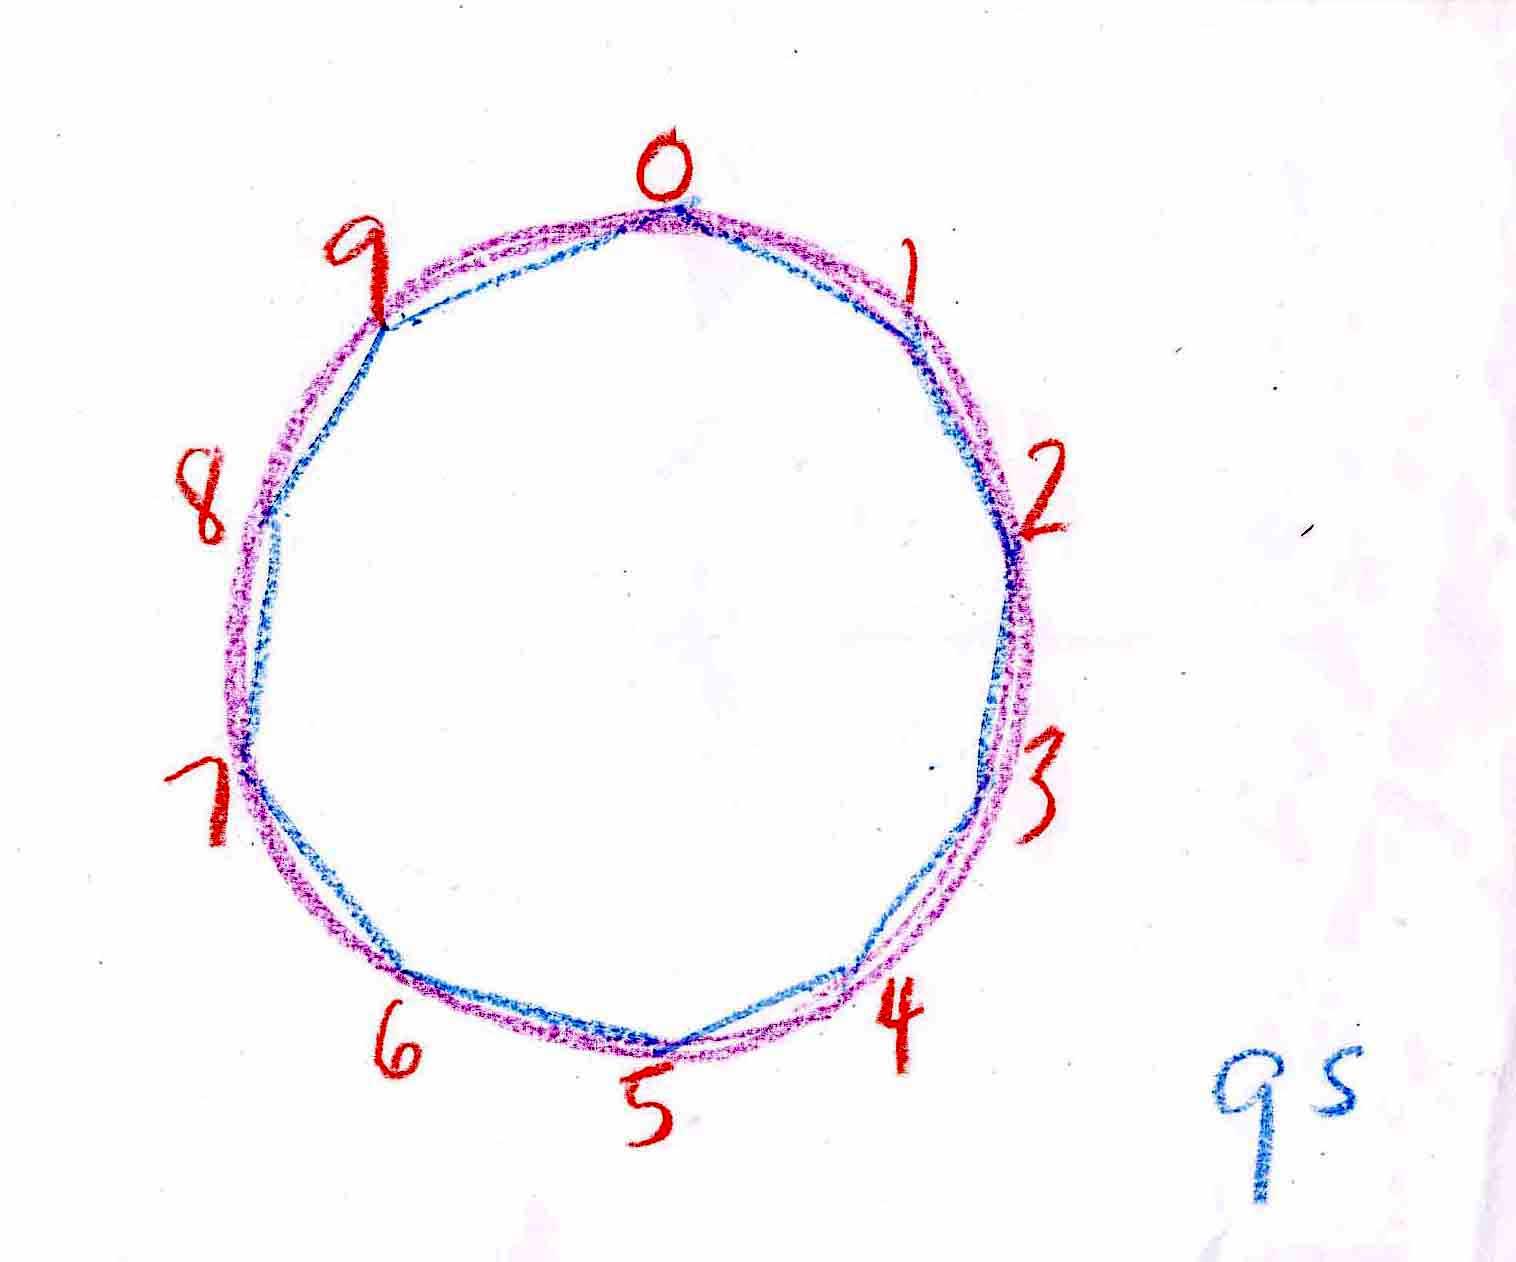 Qualitative Math Counting Stars